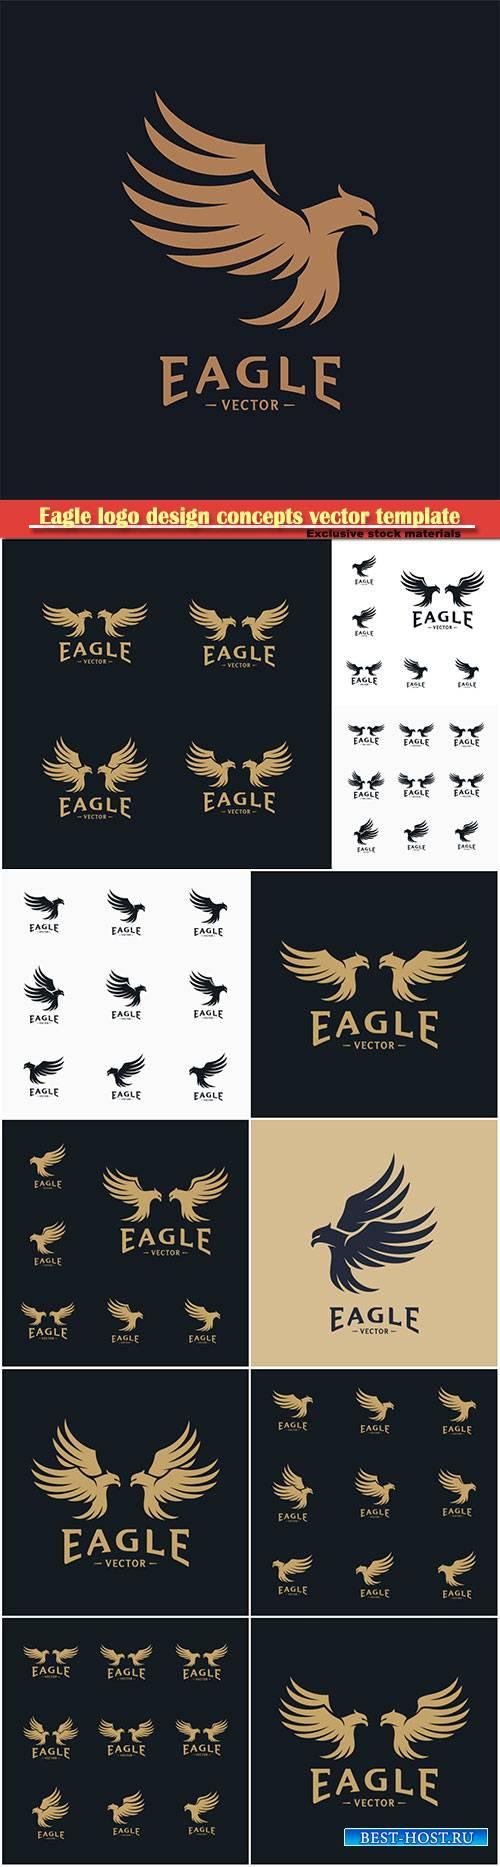 Eagle logo design concepts vector template, icon symbol